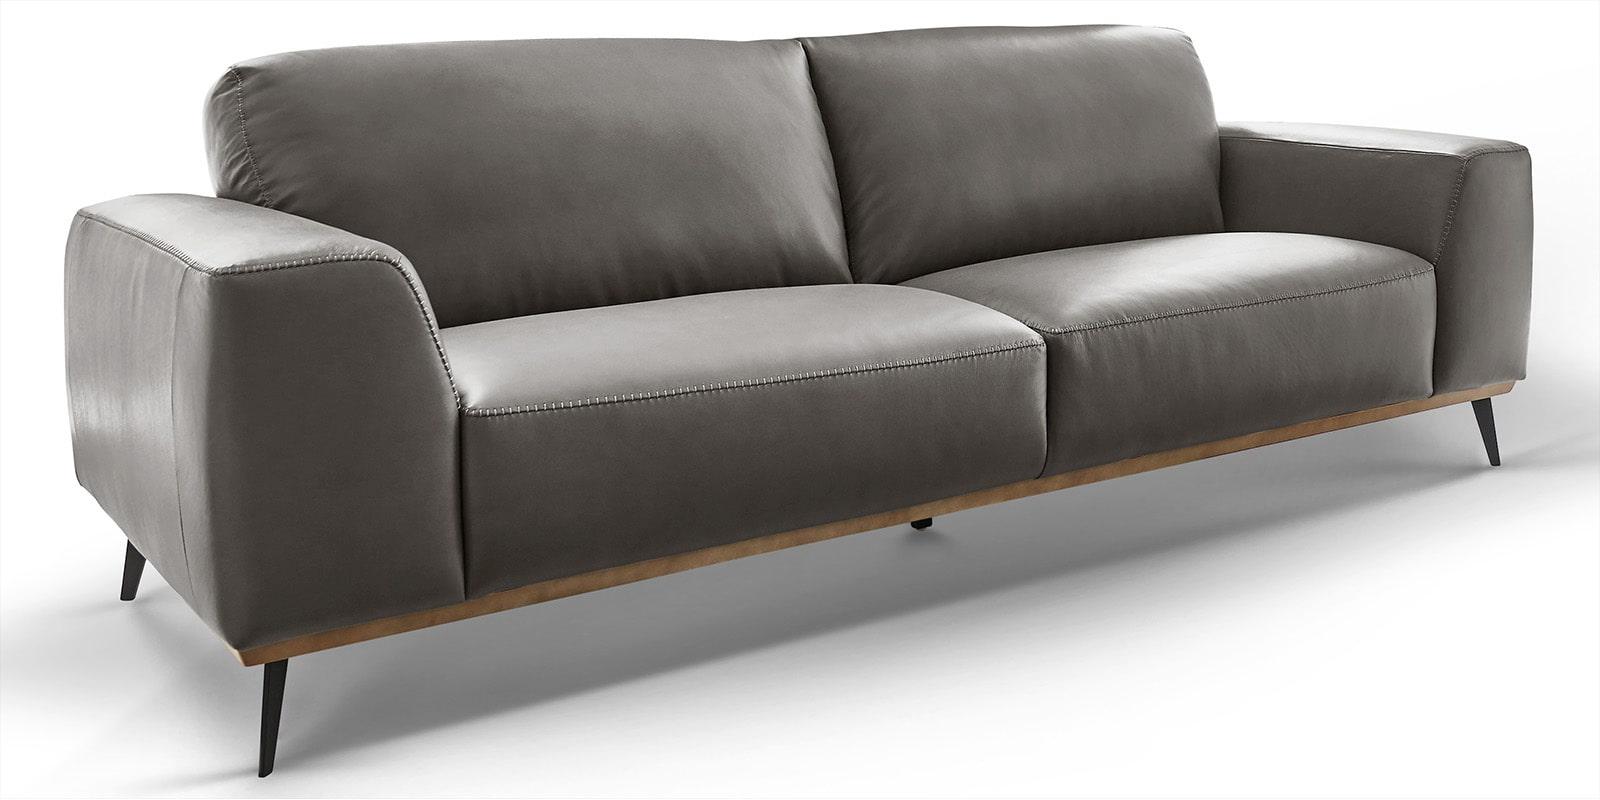 Full Size of Ledersofa Braun Ikea Vintage 3 Sitzer Cognac Leder Sofa Set Couch Pflege Designer Barcelona Skandi Design Grau Kunstleder Riess Ambiente Reinigen Weiß Polster Sofa Leder Sofa